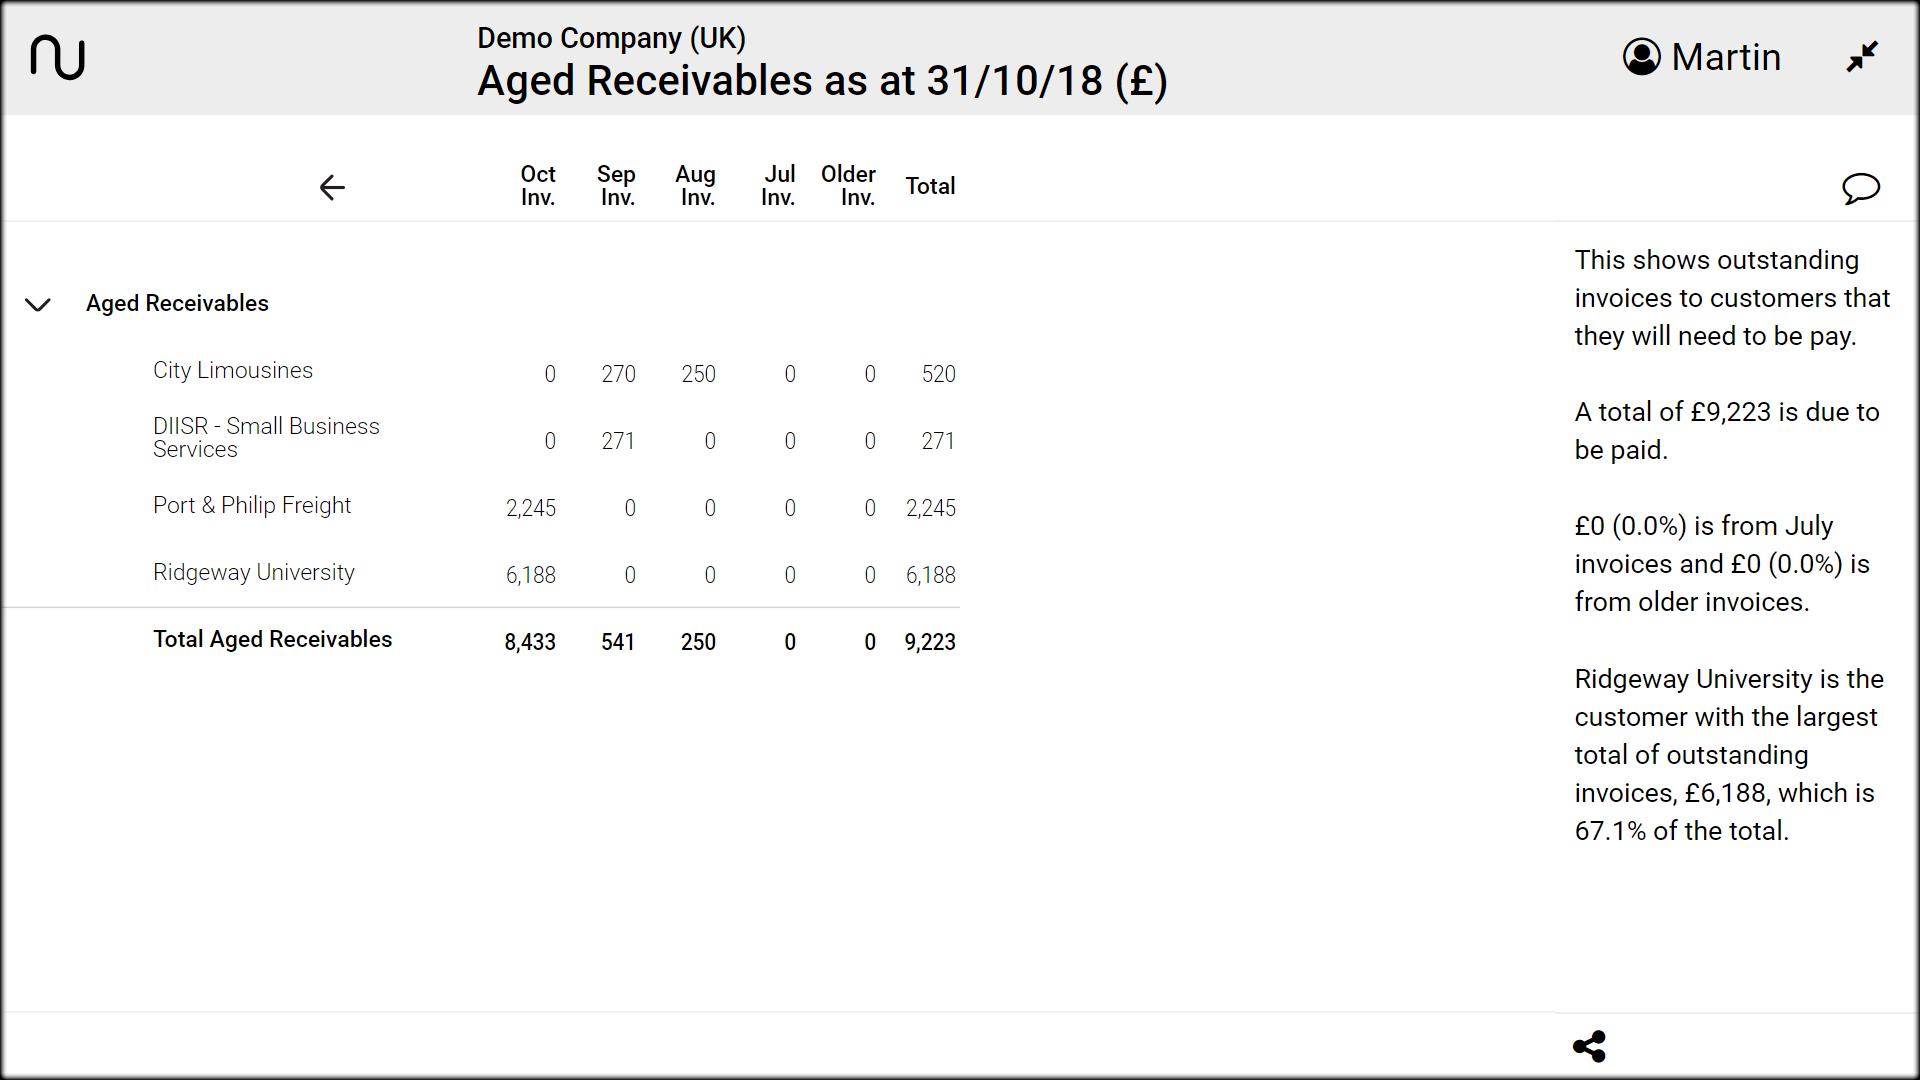 aged receivables